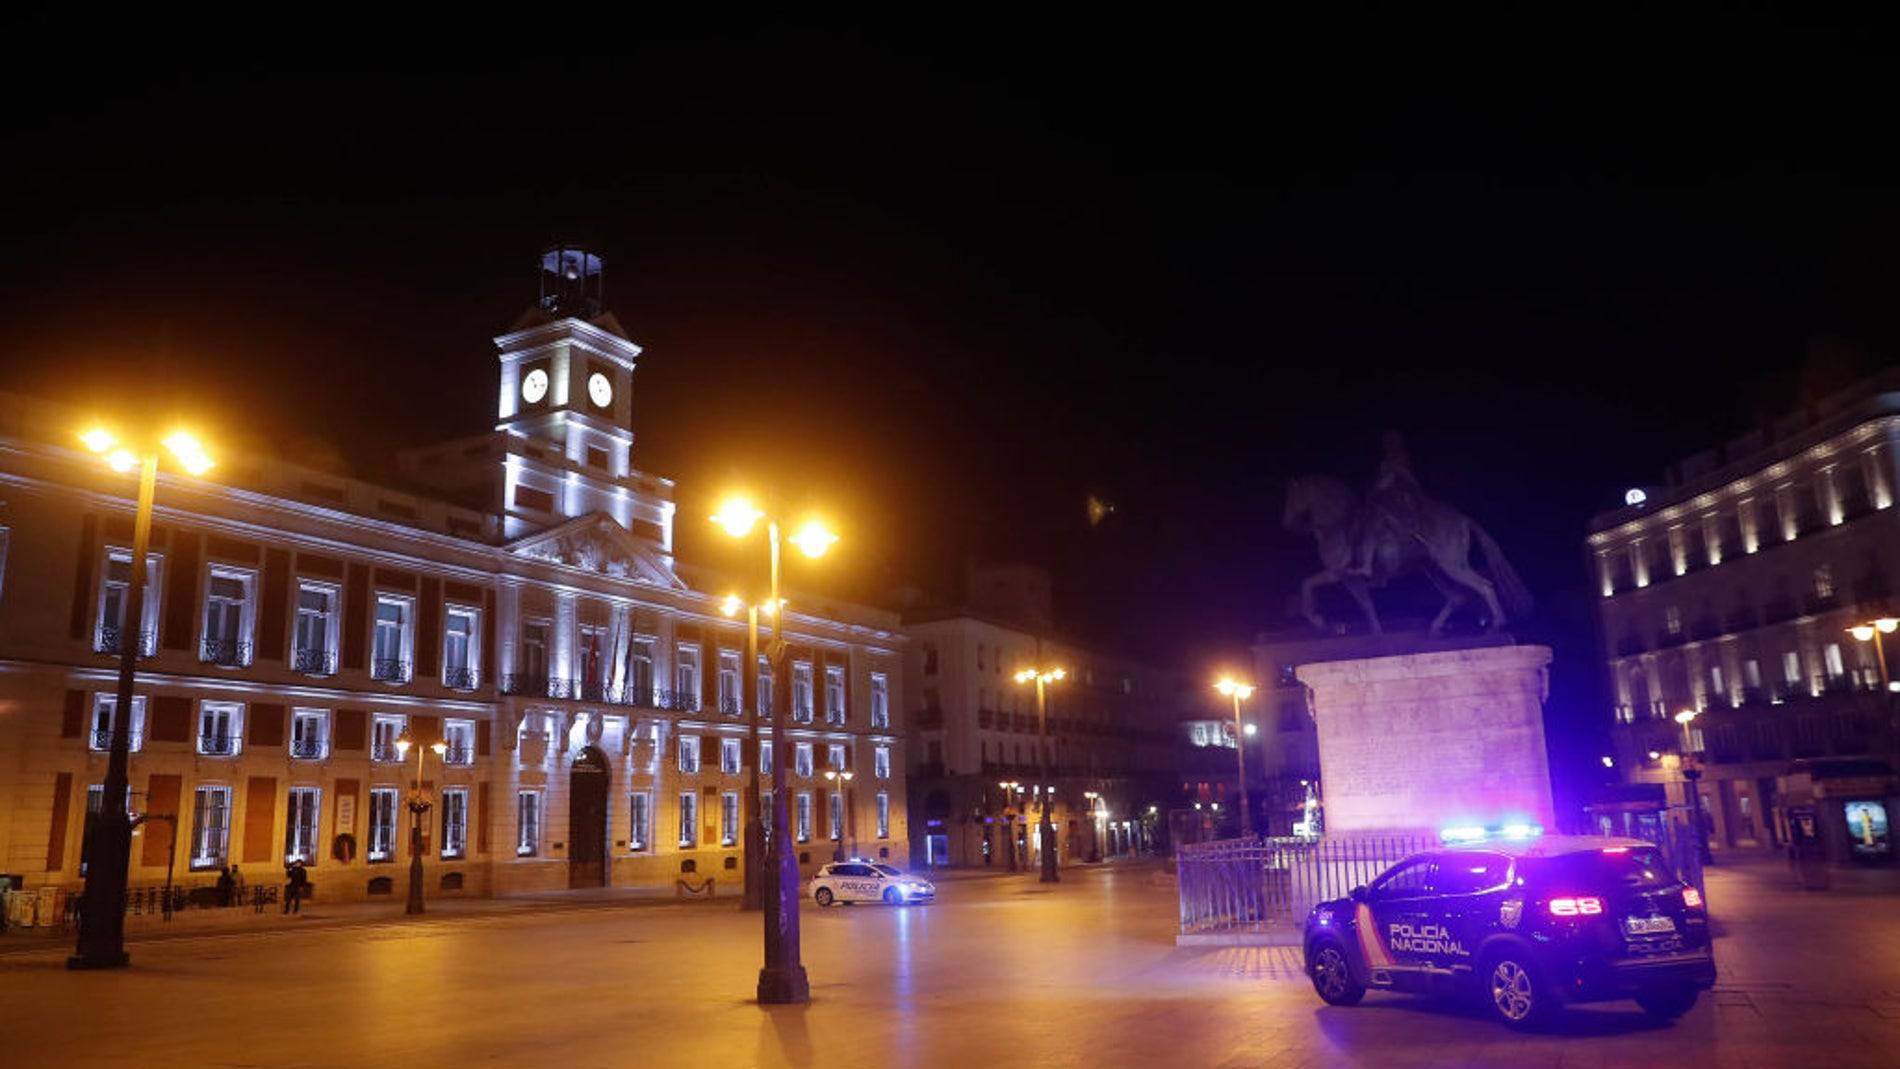 La Puerta del Sol de Madrid después del toque de queda